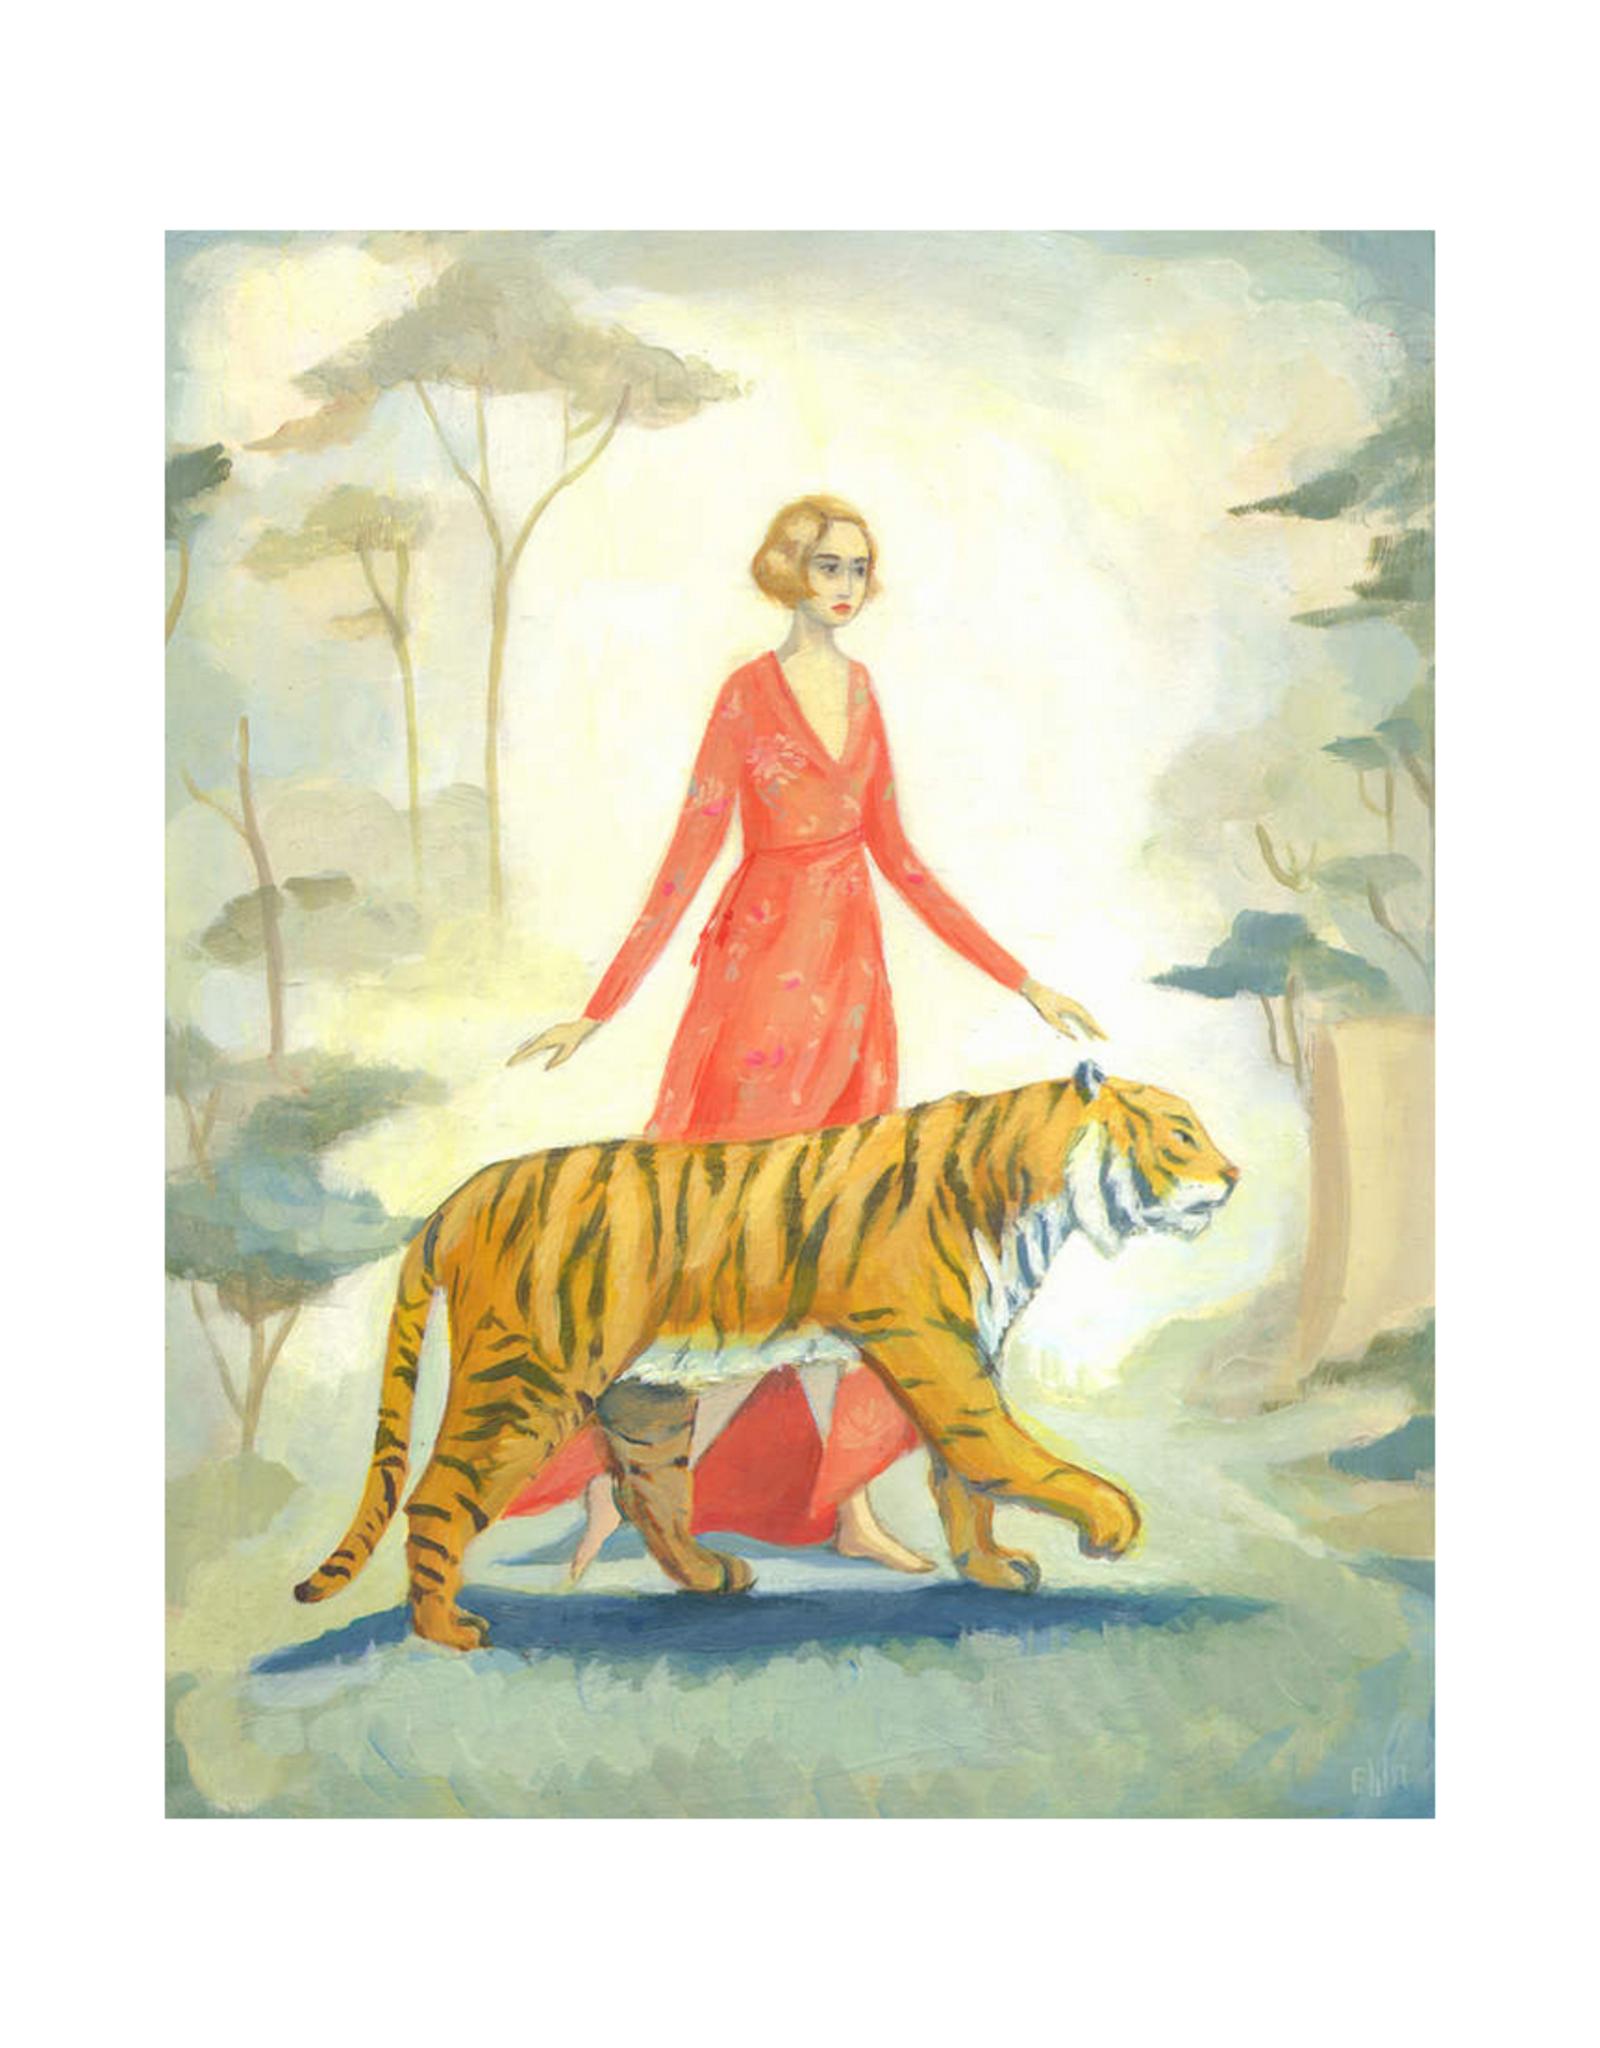 The Tiger's Bride Print